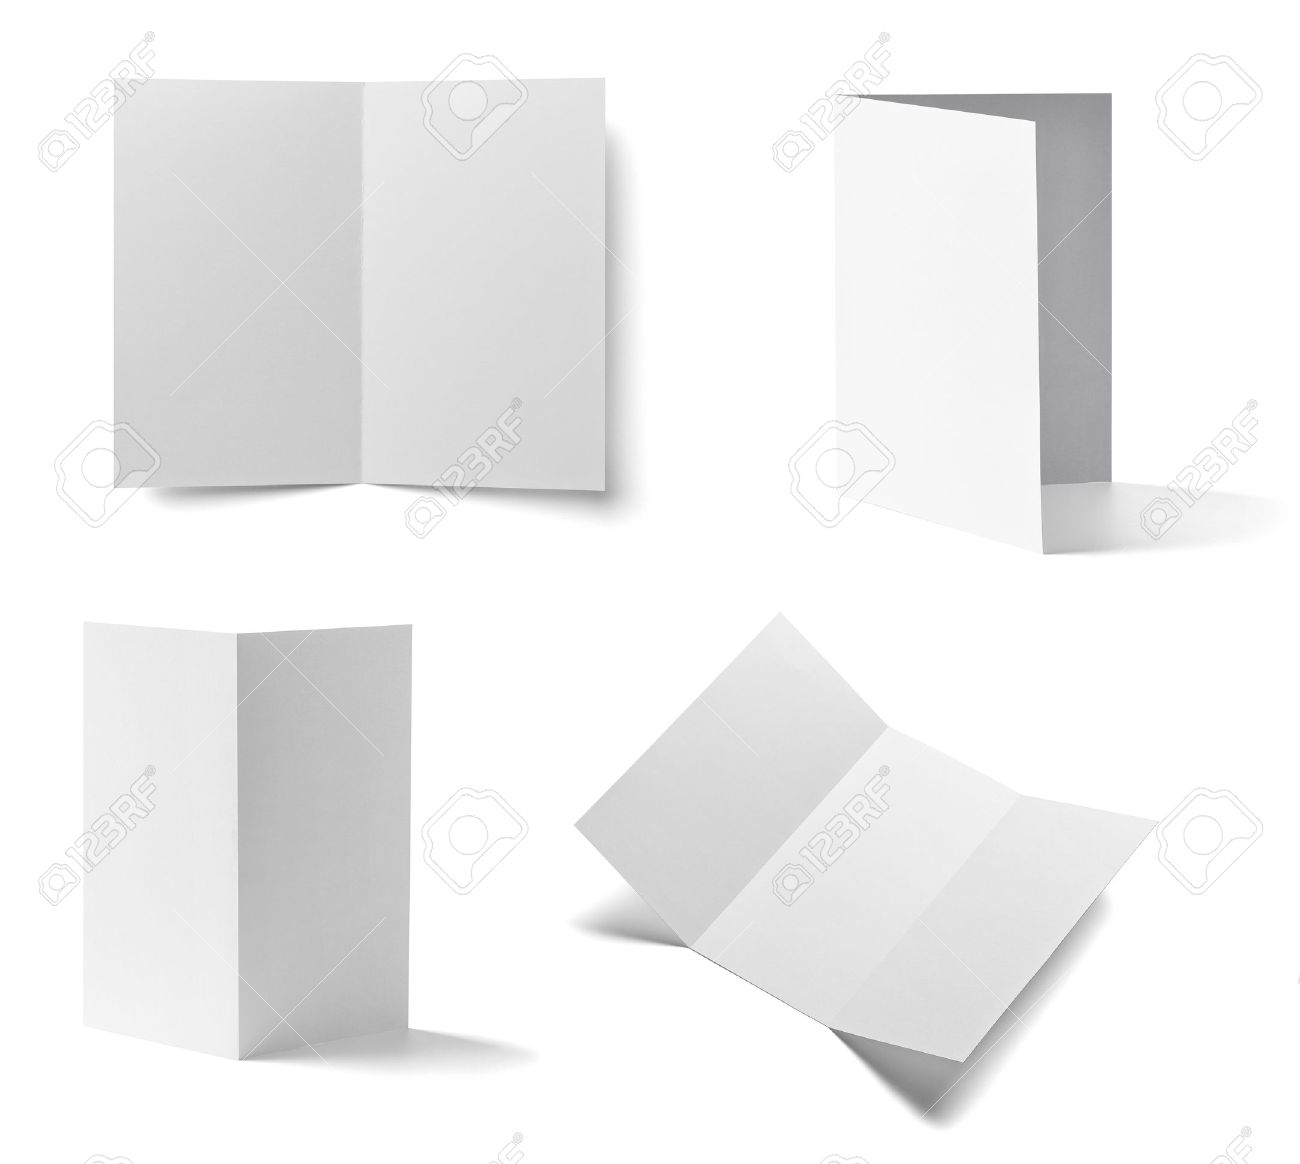 Blank Brochure Photos Pictures Royalty Free Blank – Blank Brochure